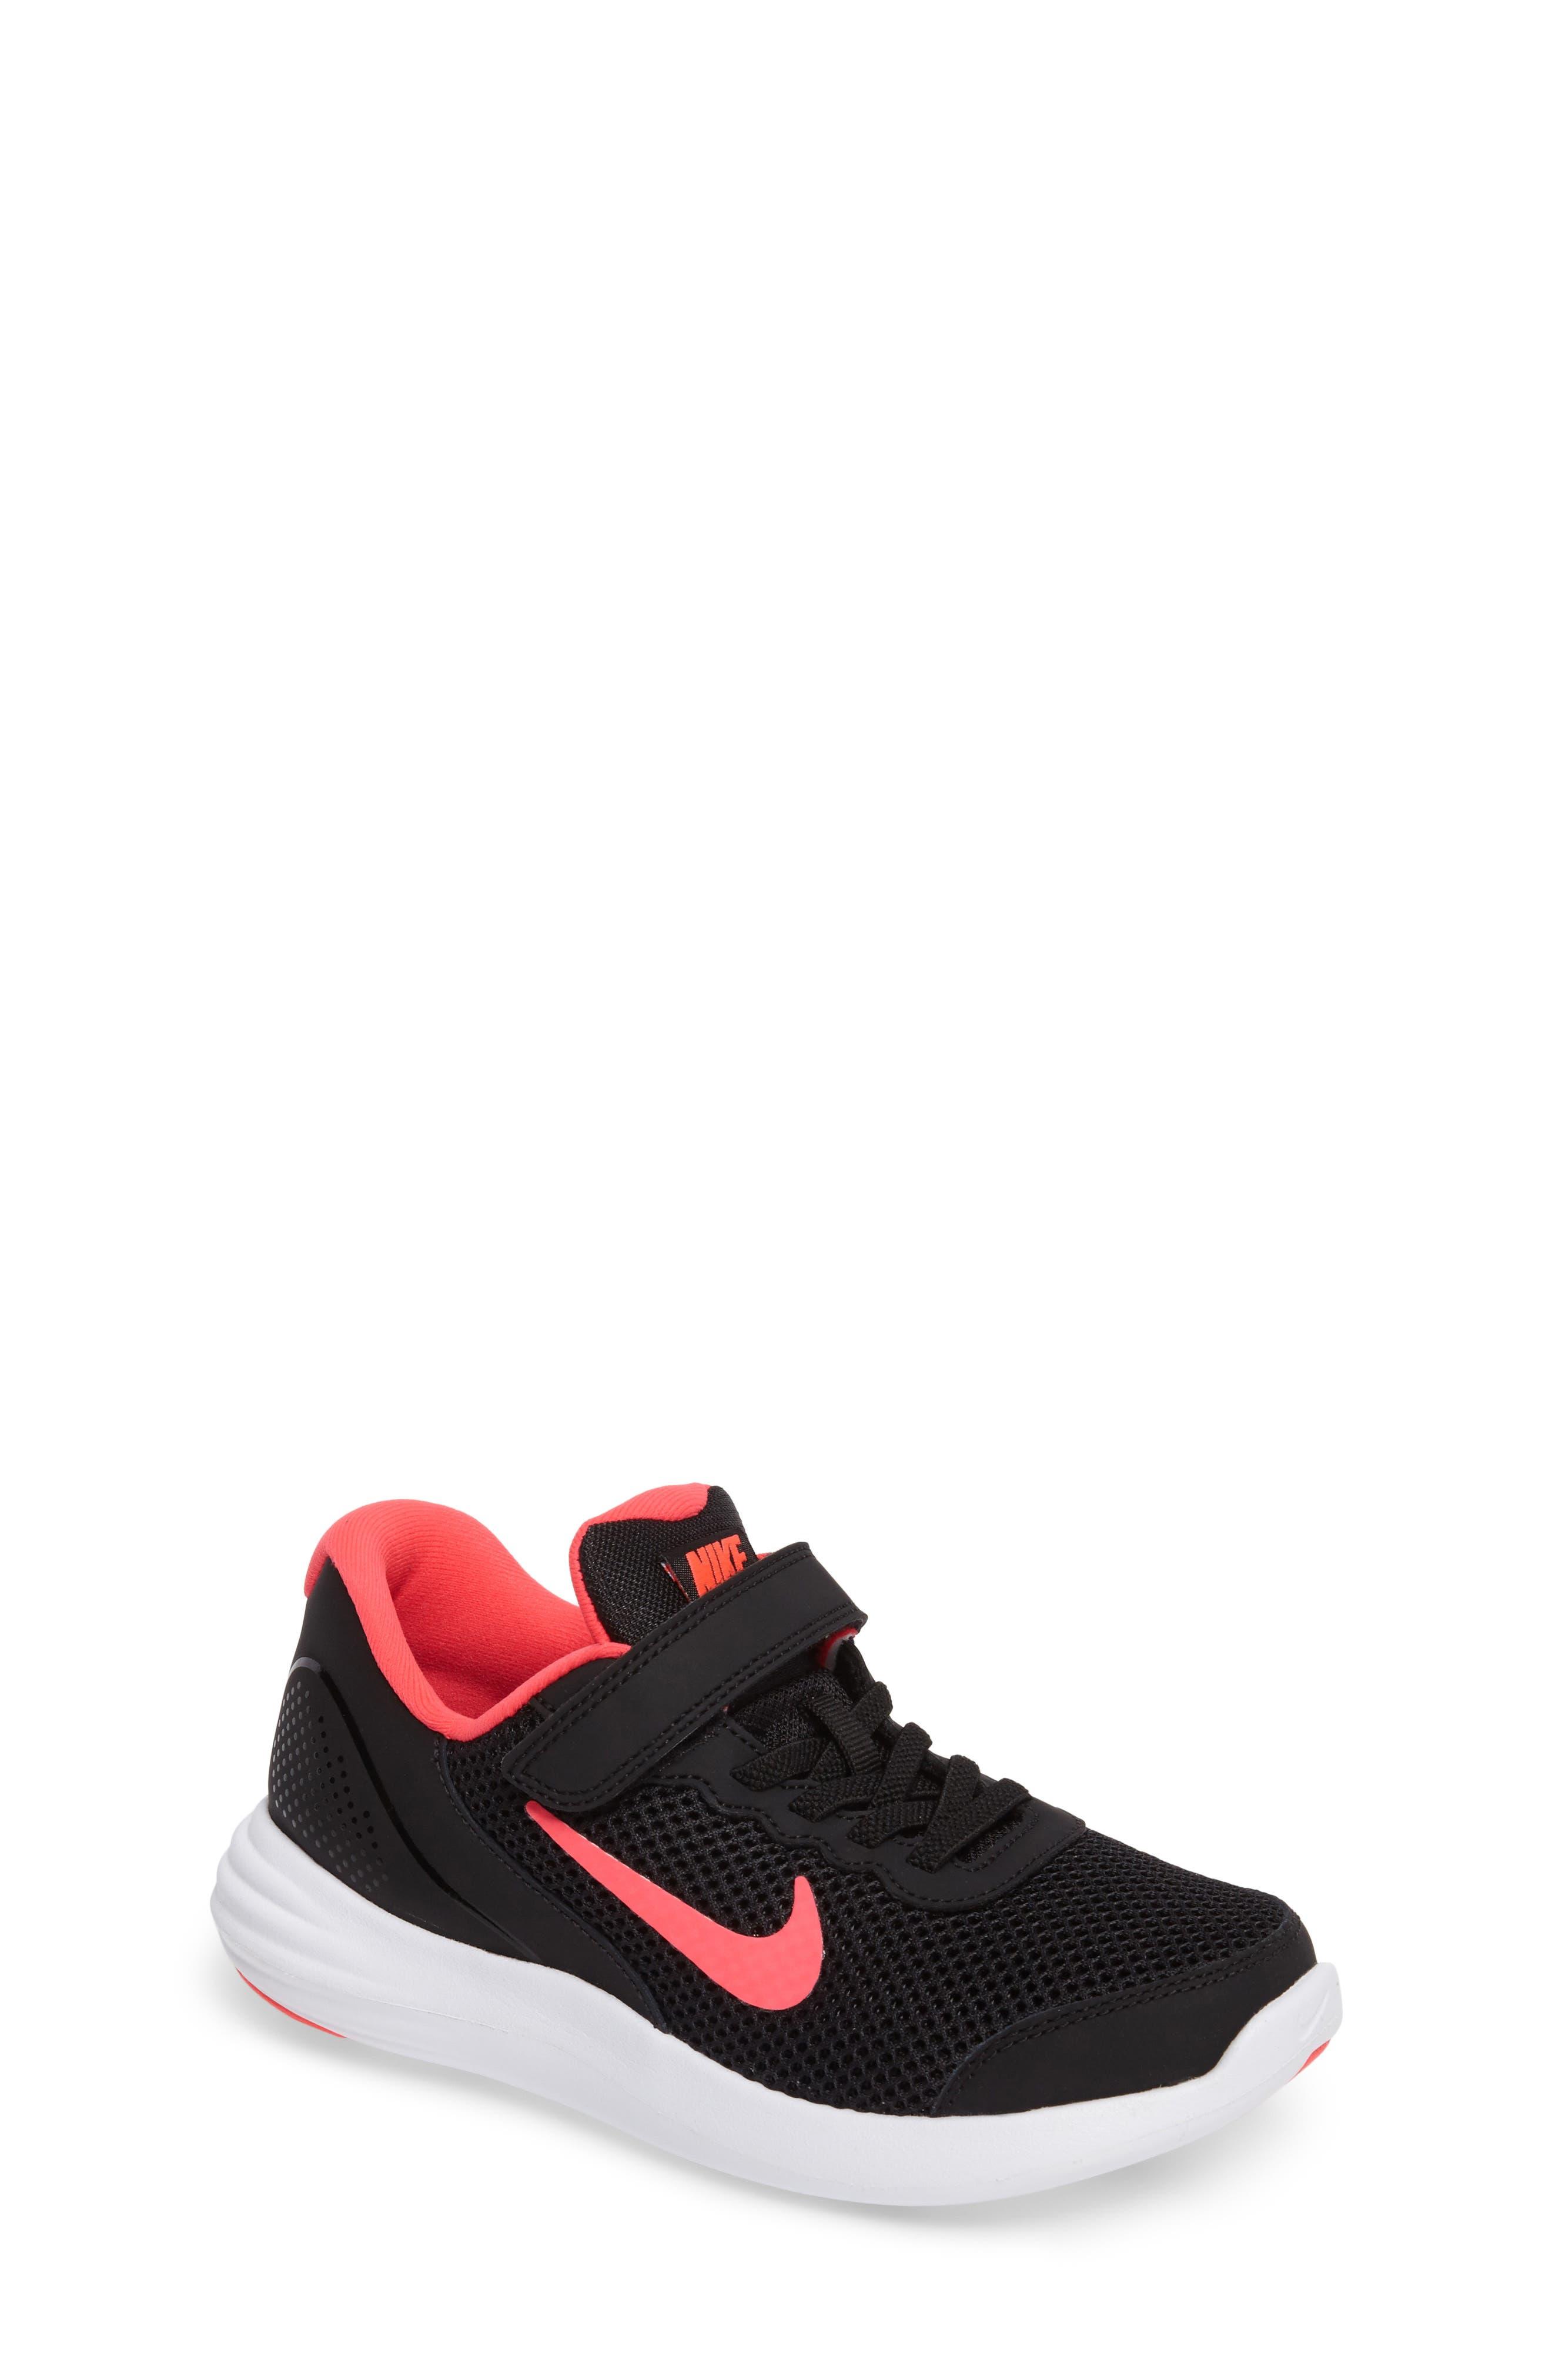 Lunar Apparent Sneaker,                         Main,                         color, 652